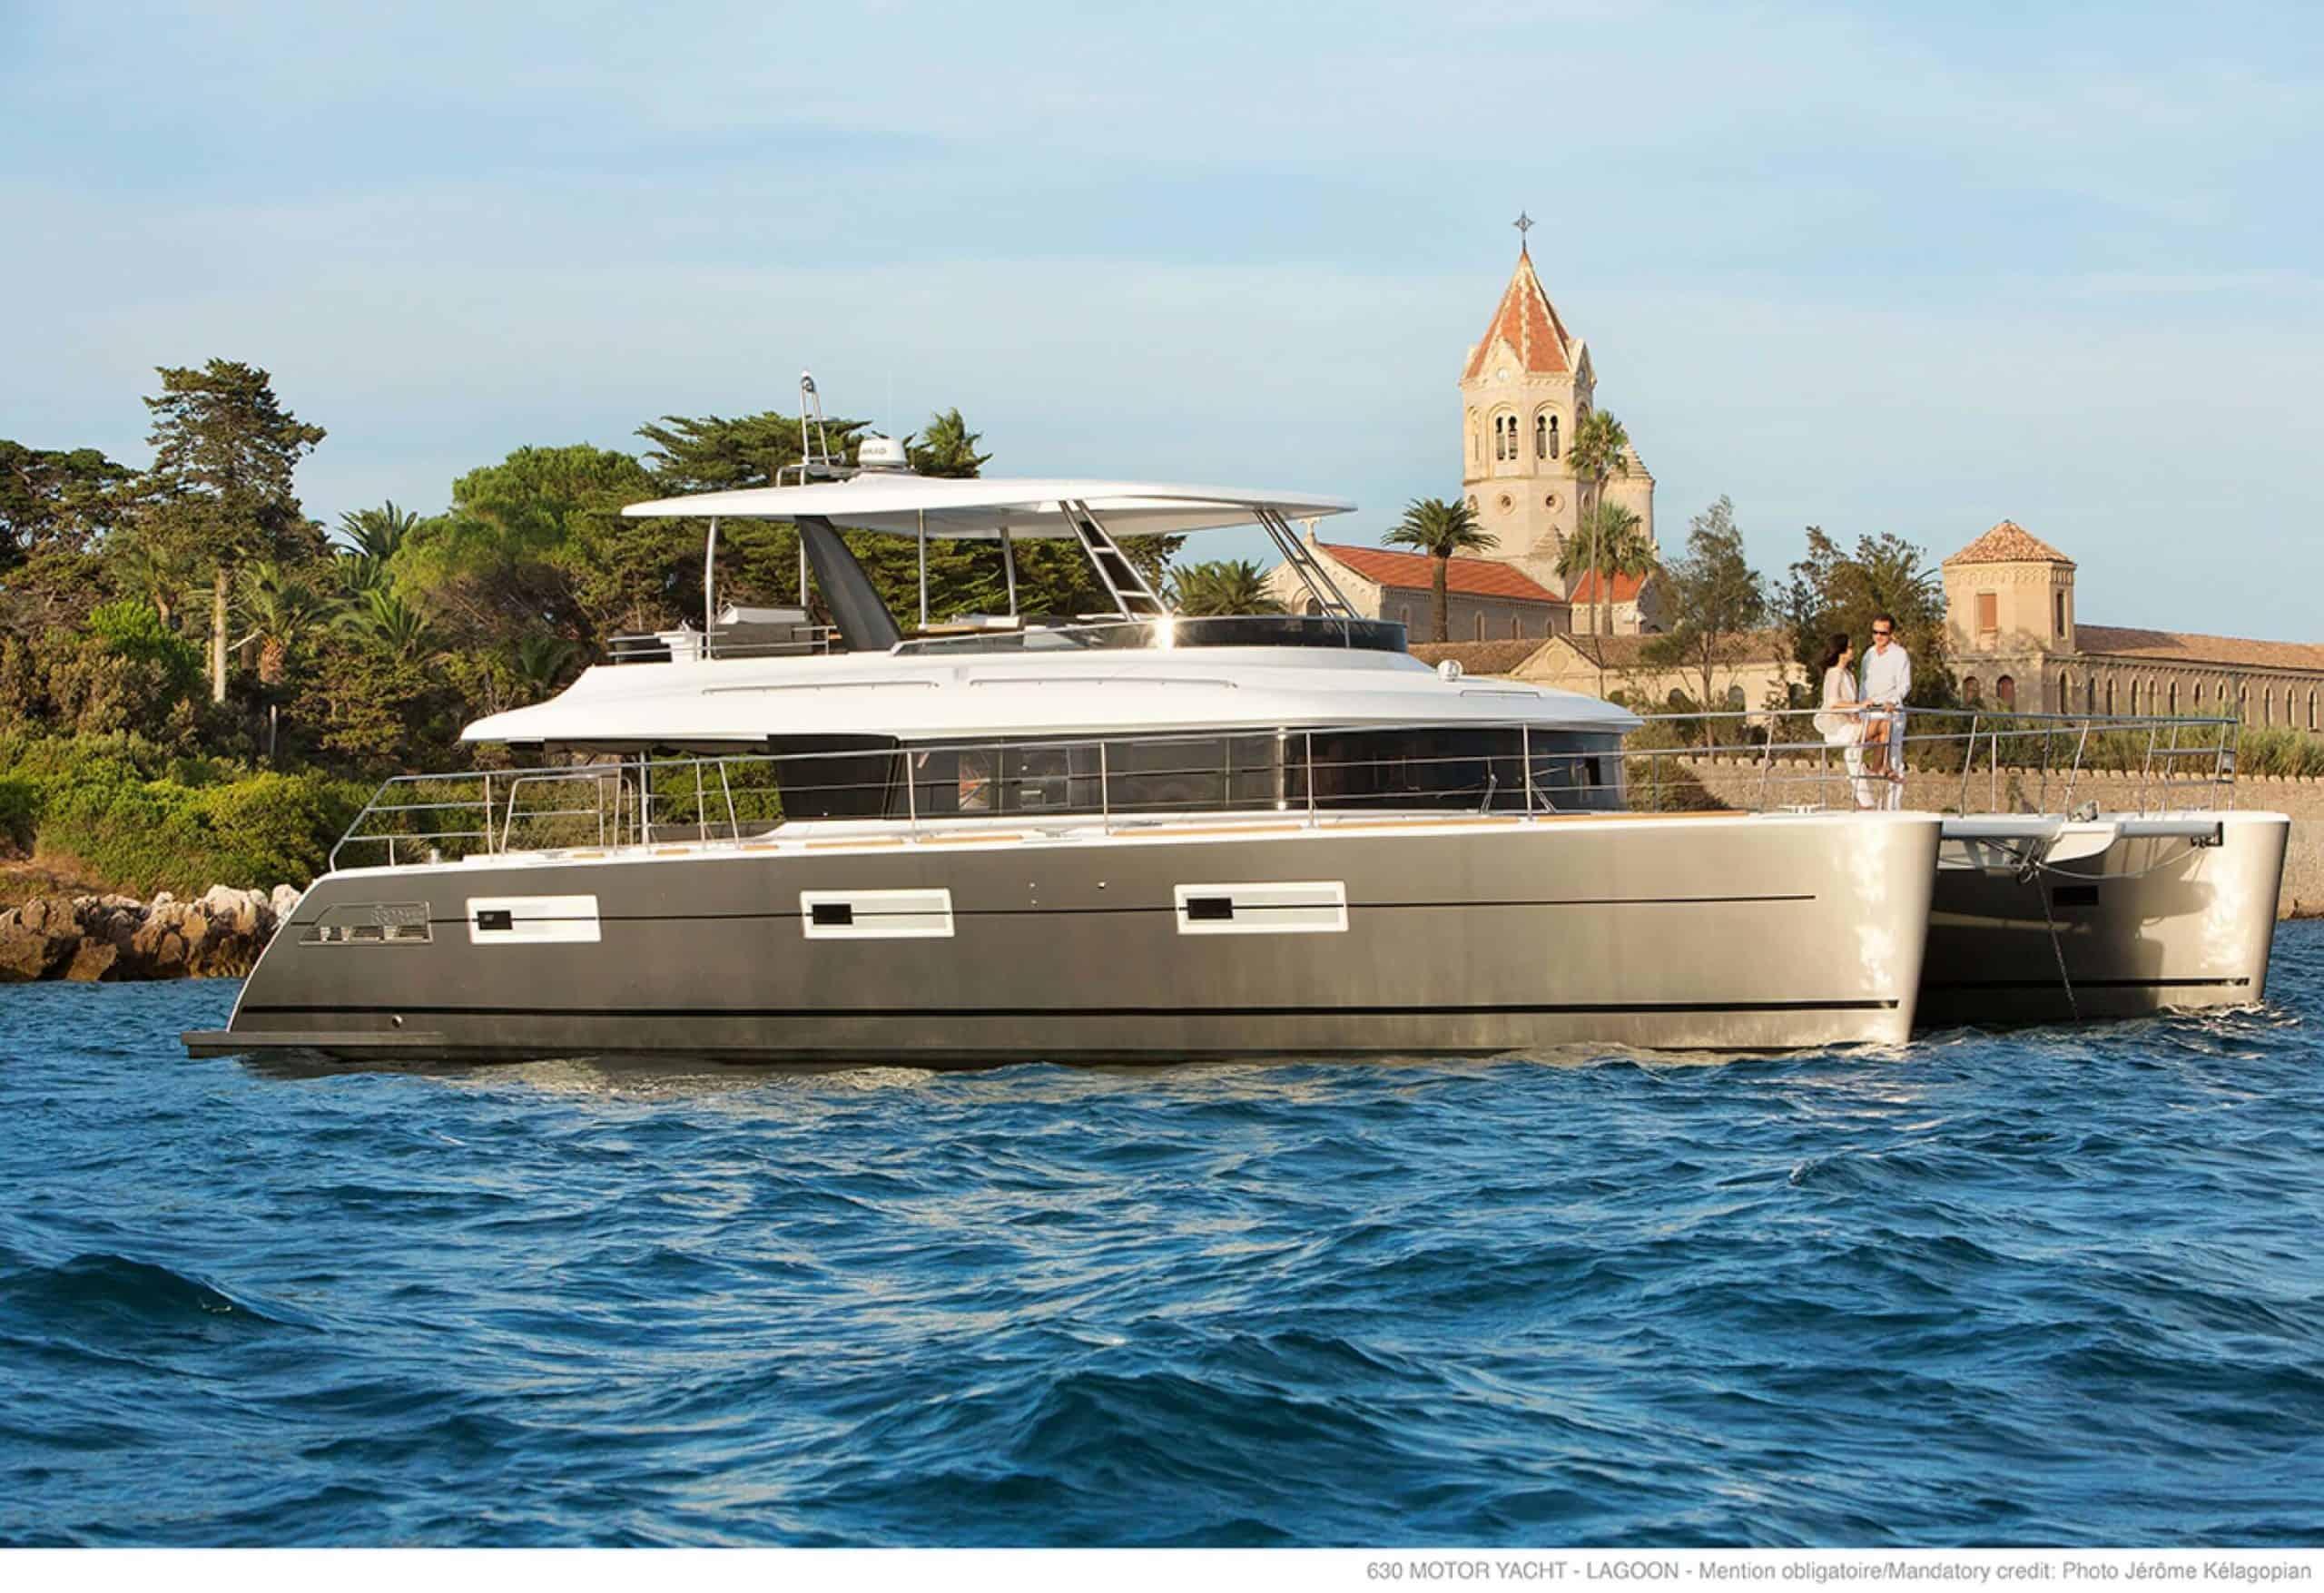 lagoon 630 my power catamaran for sale